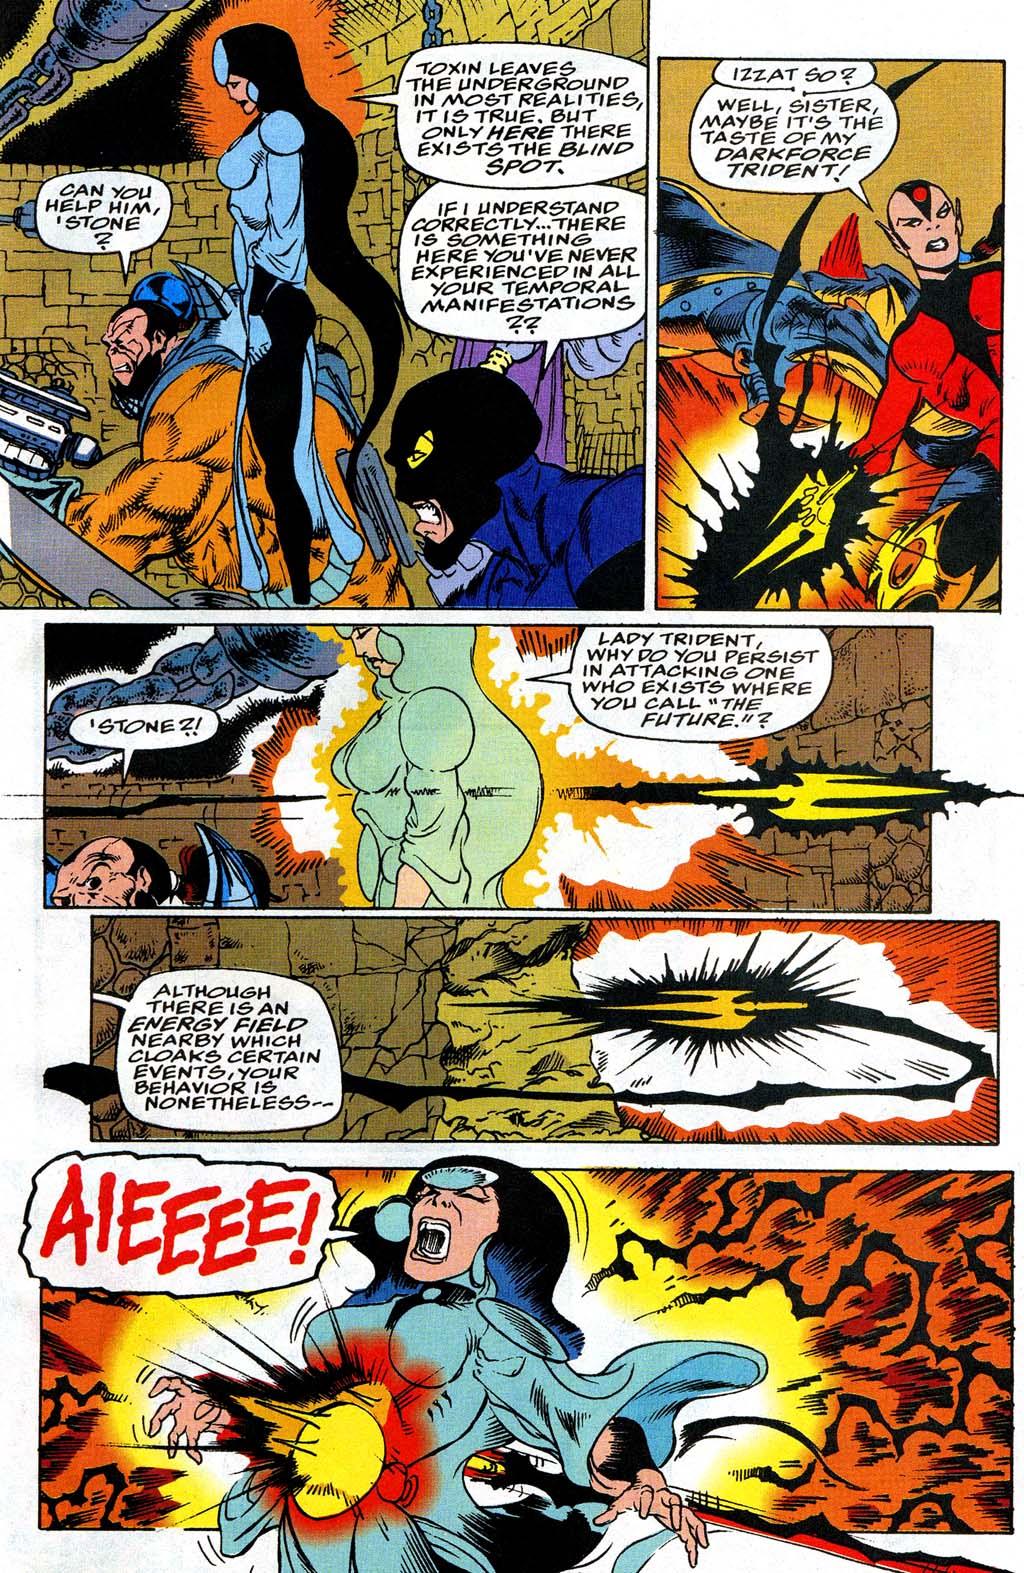 Read online Blackwulf comic -  Issue #10 - 6